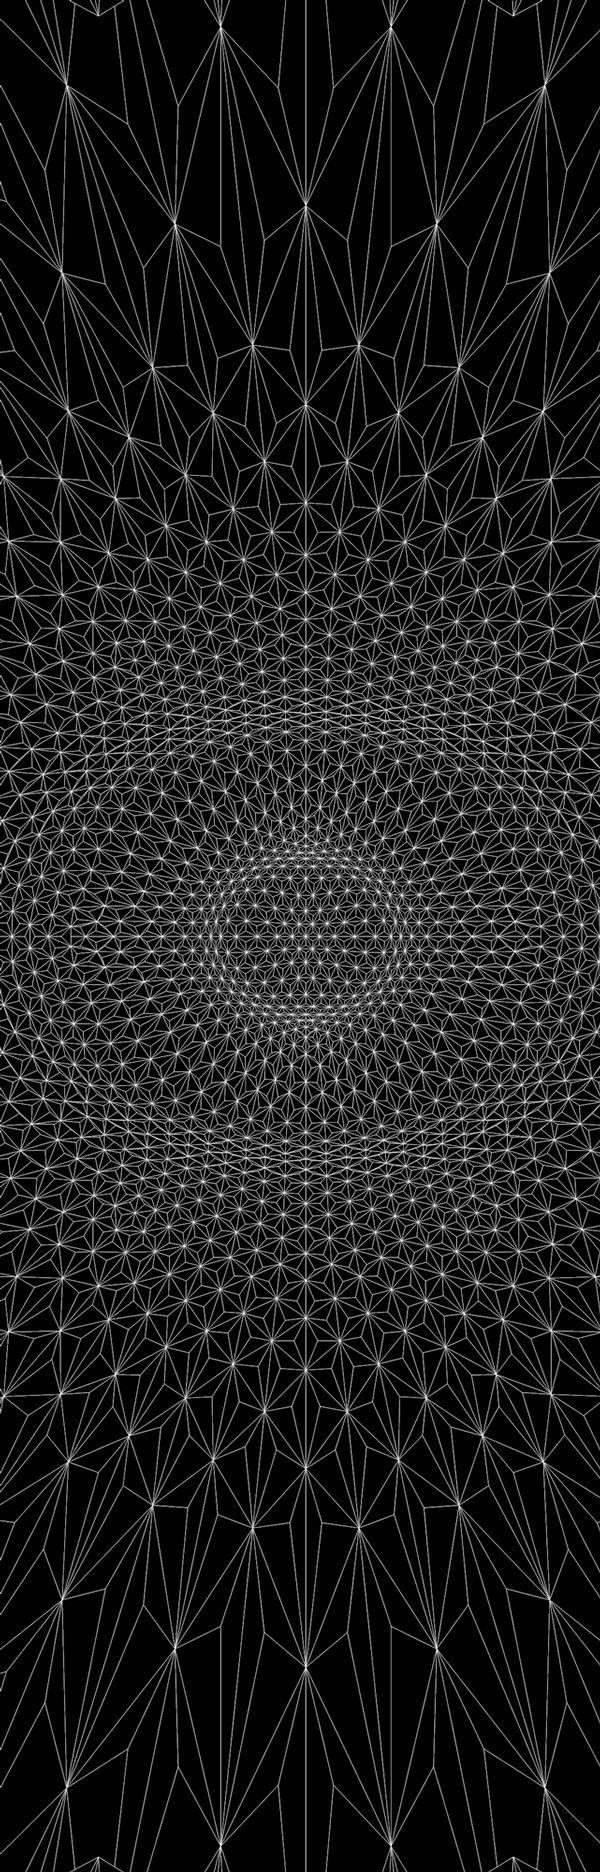 e:merge | Anaglyph 3D A/V Performance / Sacred Geometry <3